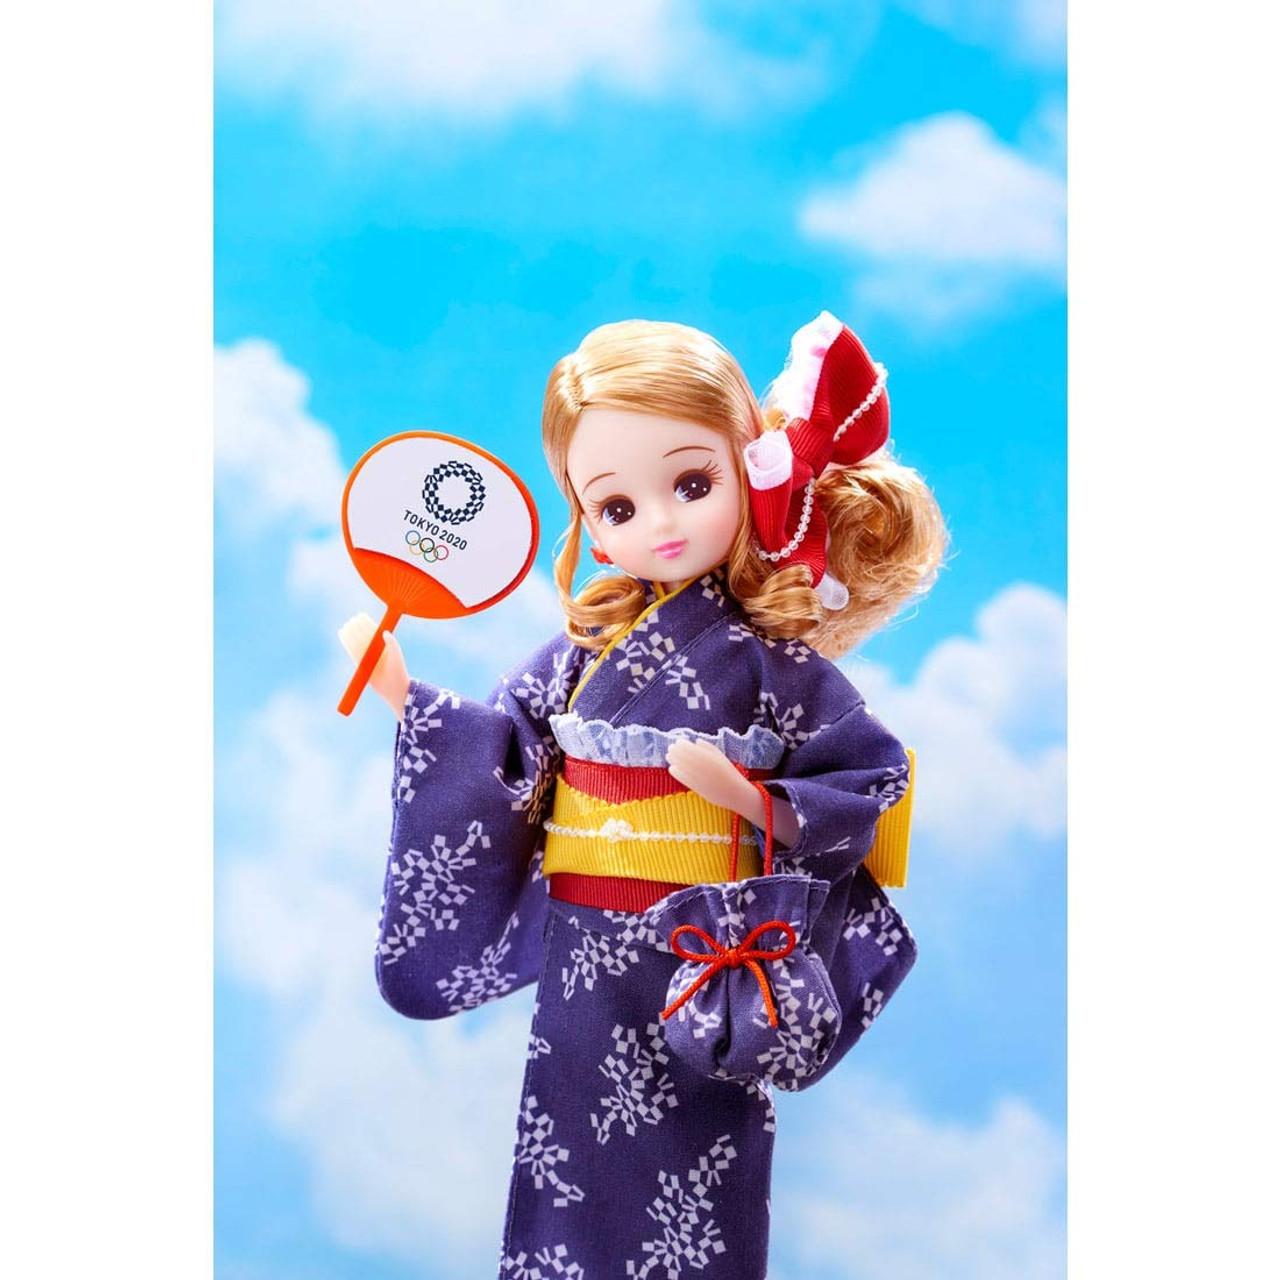 Licca chan Yukata Tokyo 2020 Paralympic Olympic Emblem Official Kimono set of 2